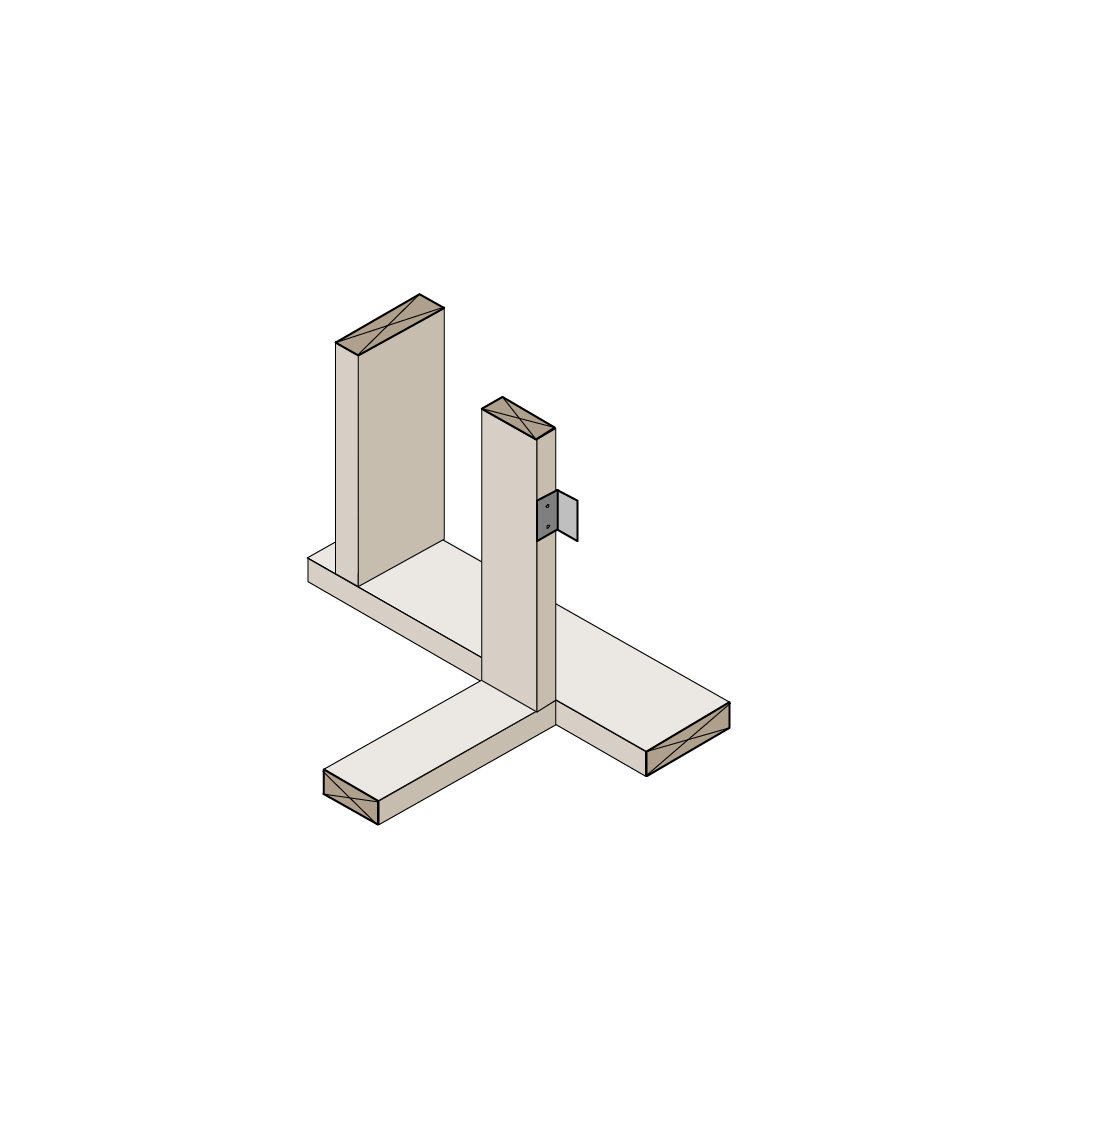 Exterior Top Plate : Advanced framing insulated interior exterior wall